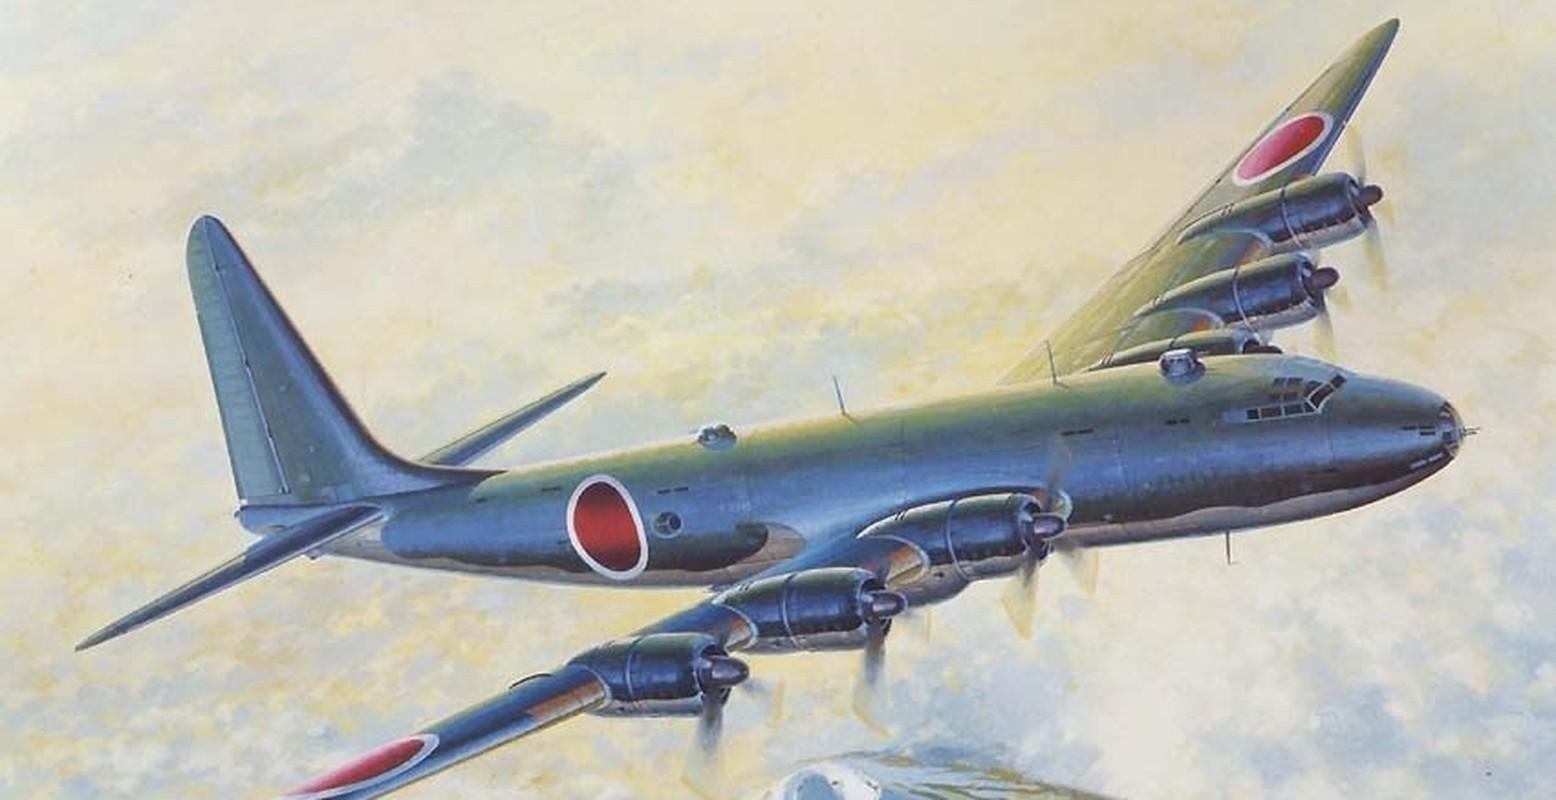 Nhat tung thiet ke may bay nem bom bay duoc nua vong Trai Dat-Hinh-10